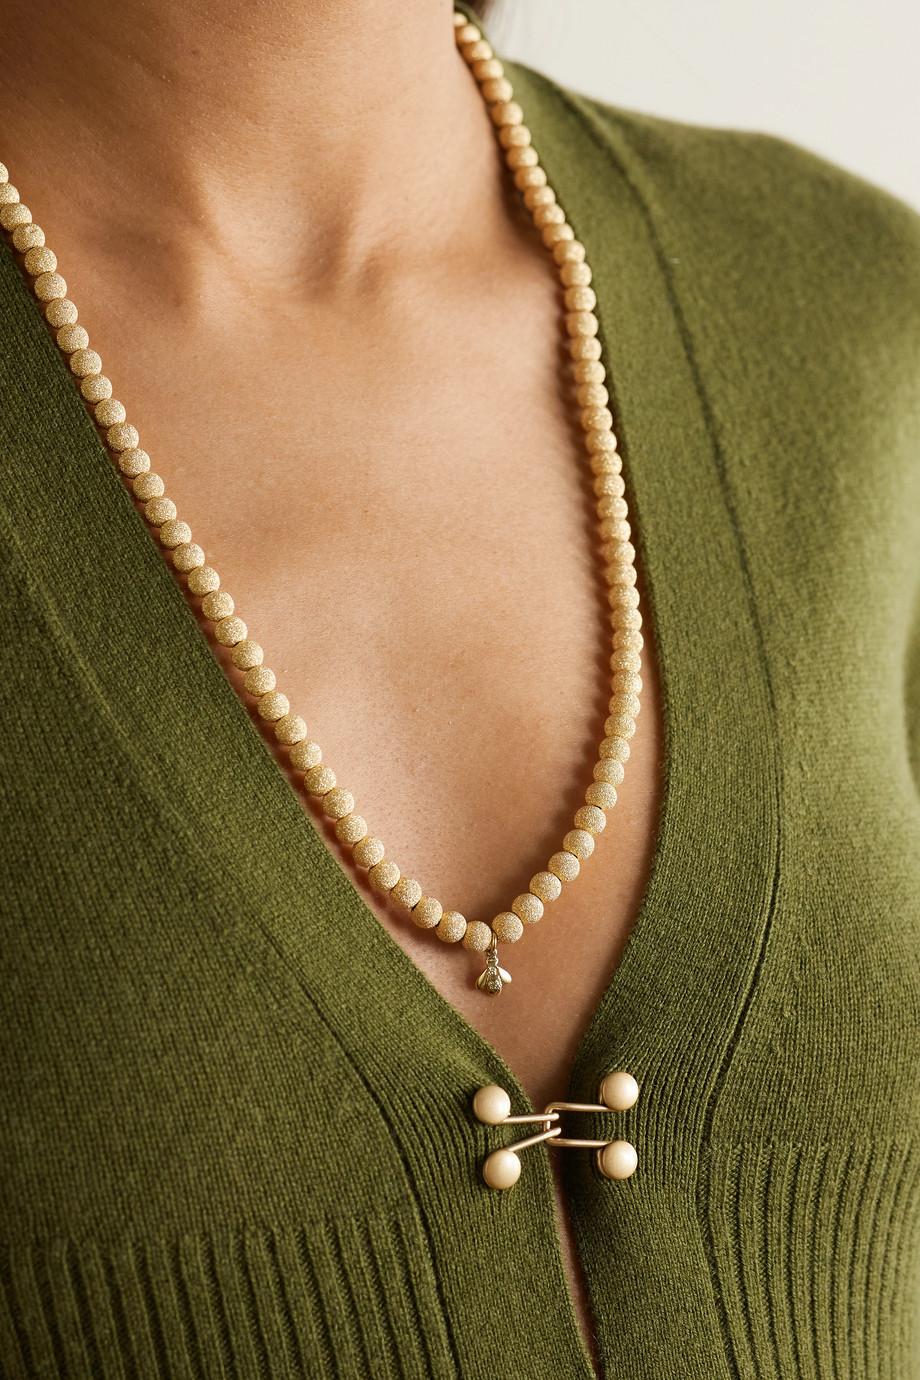 Carolina Bucci Florentine Kette aus 18 Karat Gold